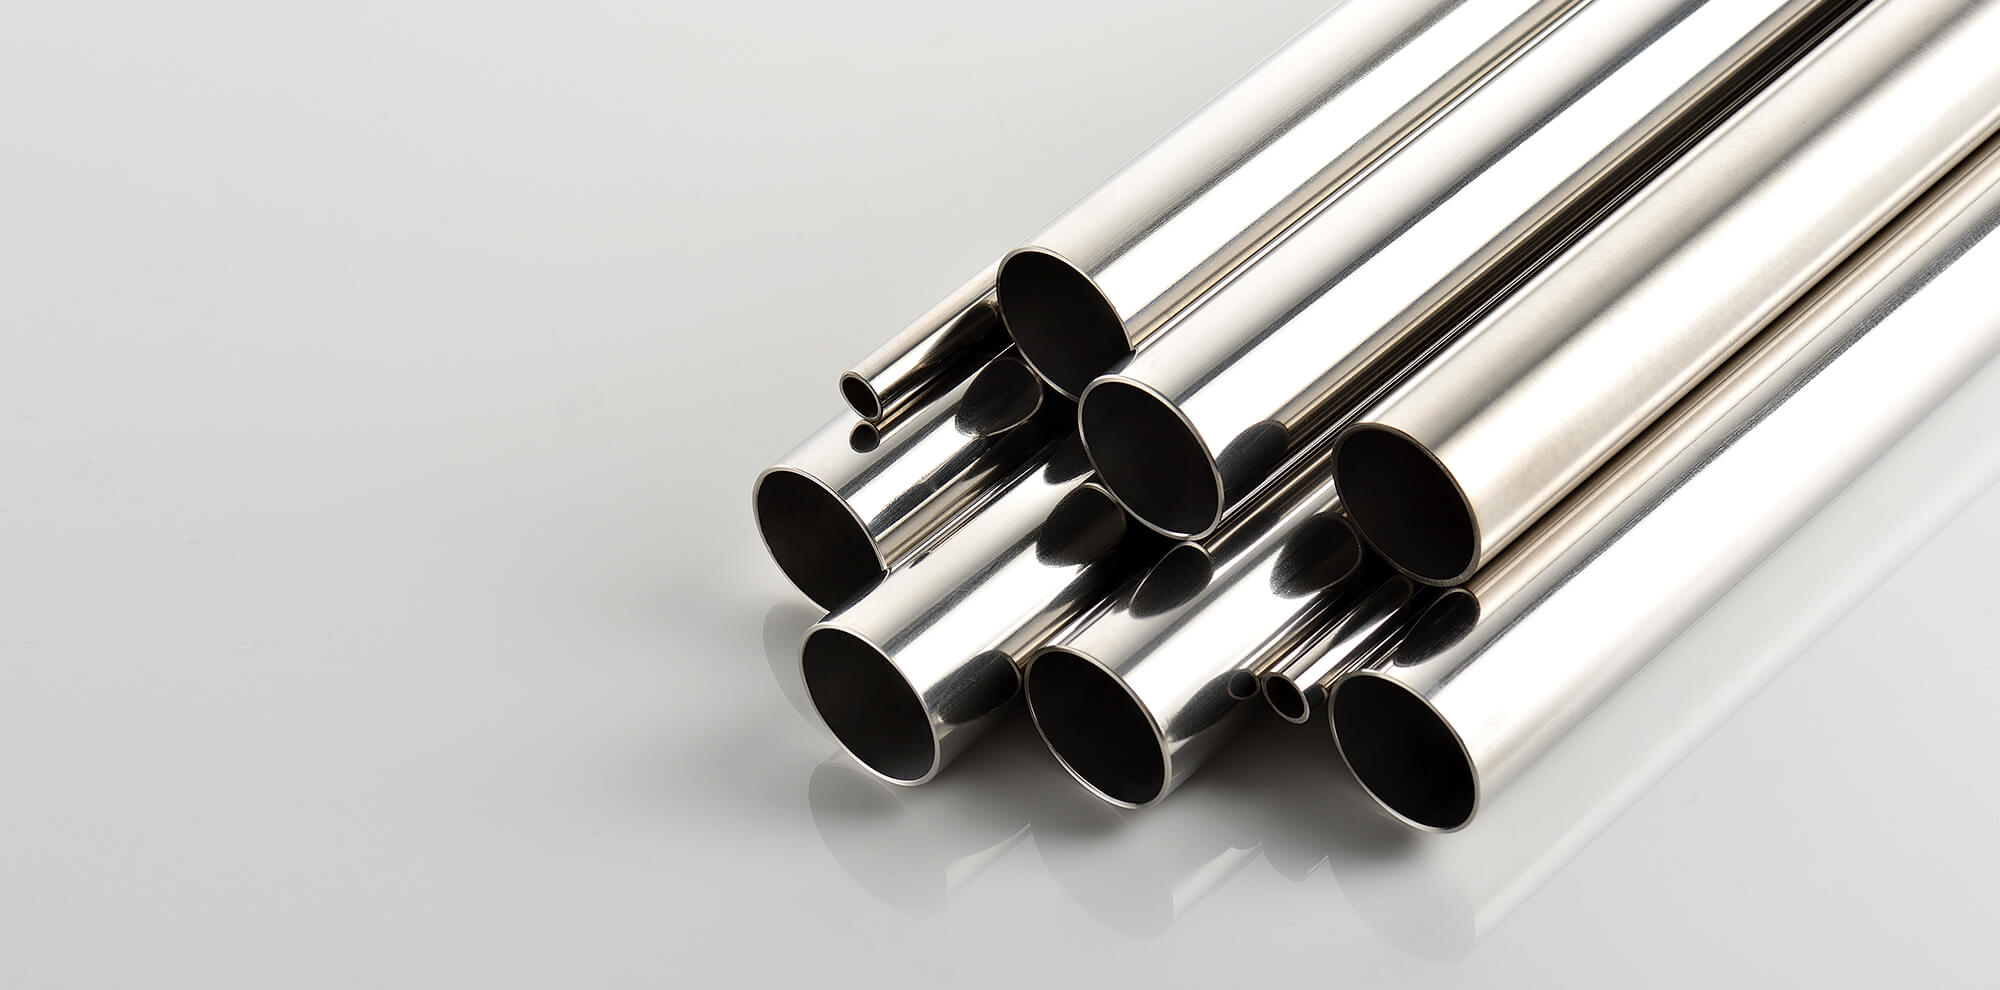 22mm stainless steel tube